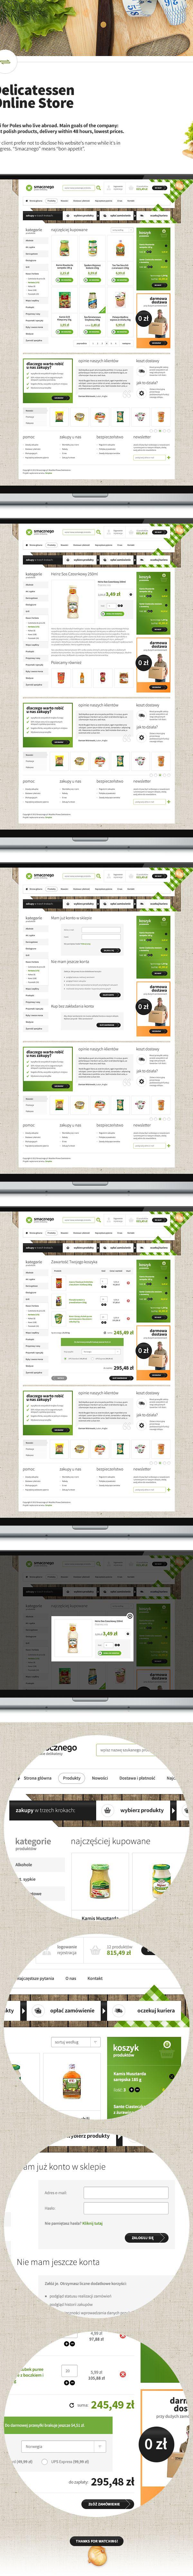 Delicatessen - Online Store by Mateusz Kolebuk, via Behance